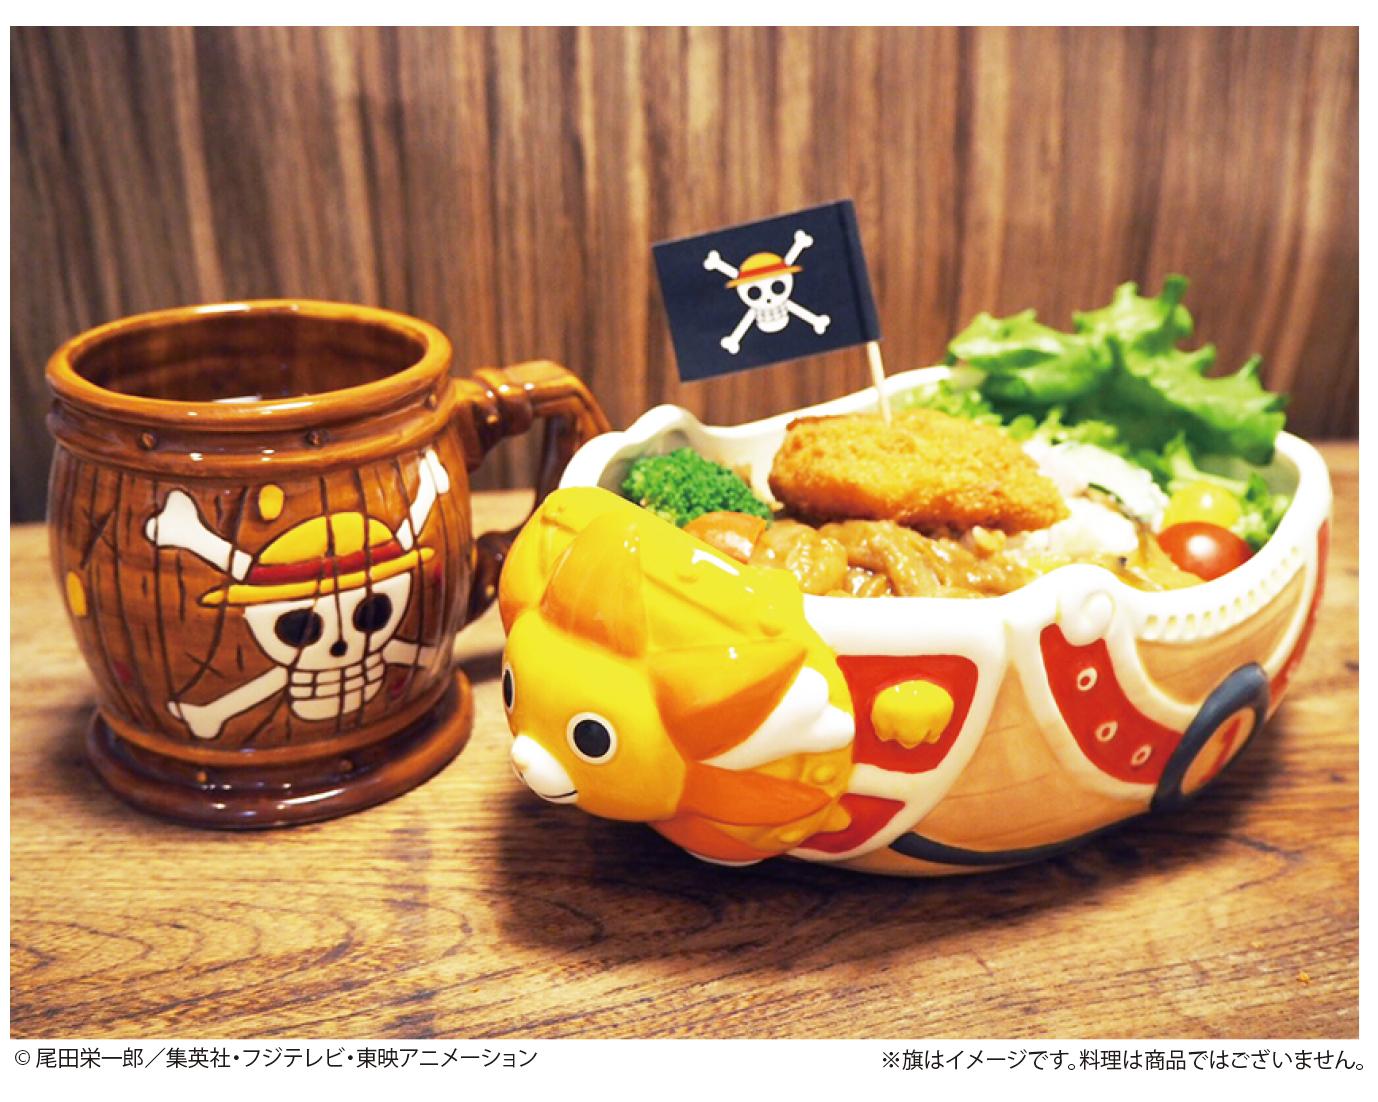 『ONE PIECE』「サニー号」の大きなお皿7/15~発売!!